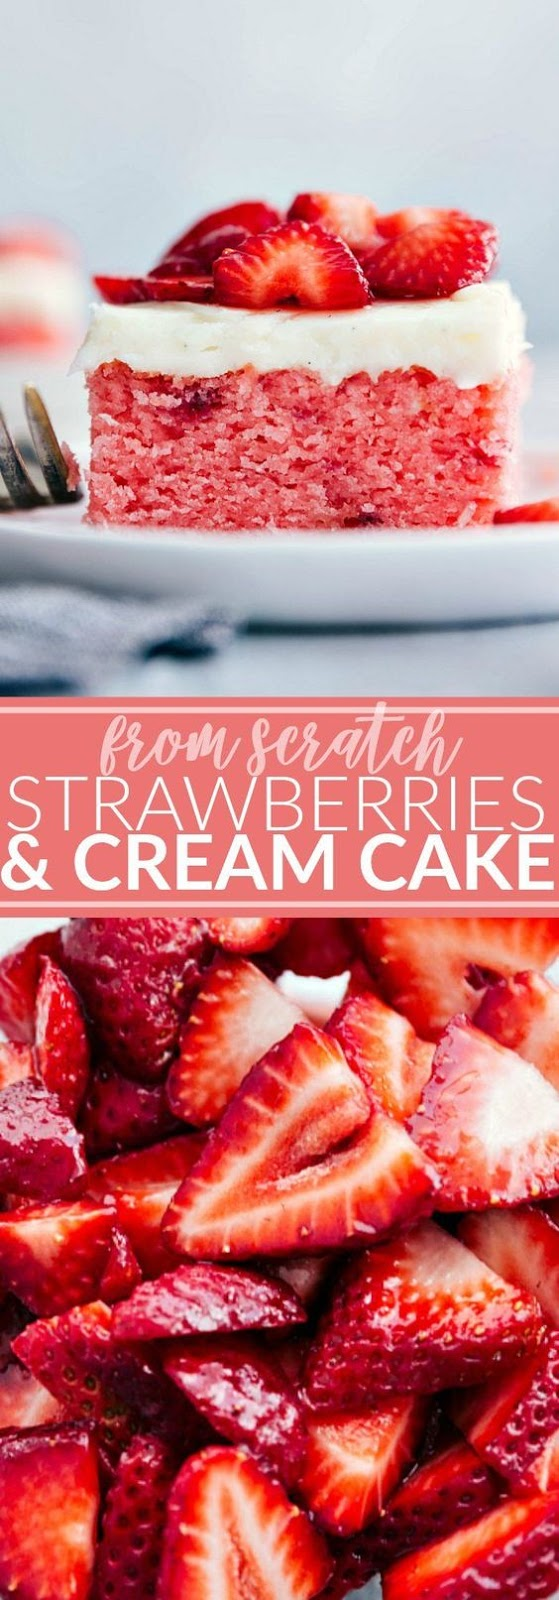 Strawberries and Cream Cake #desserrt #valentine #strawberries #cream #cake